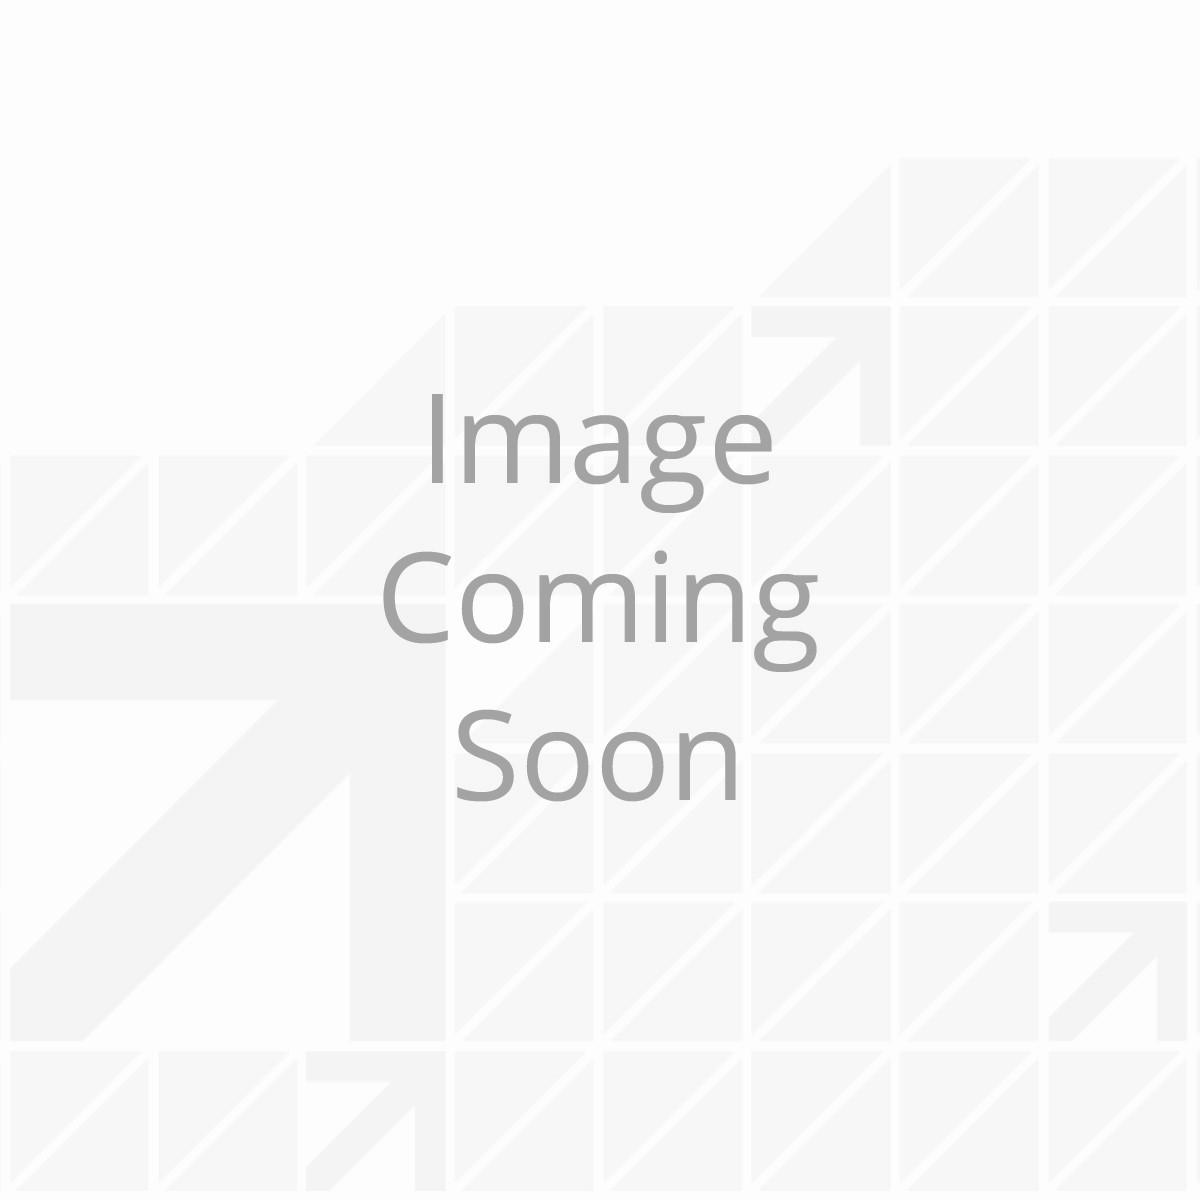 19' Power & Hybrid Awning Roller Assembly - Prepflex Burgundy Fade